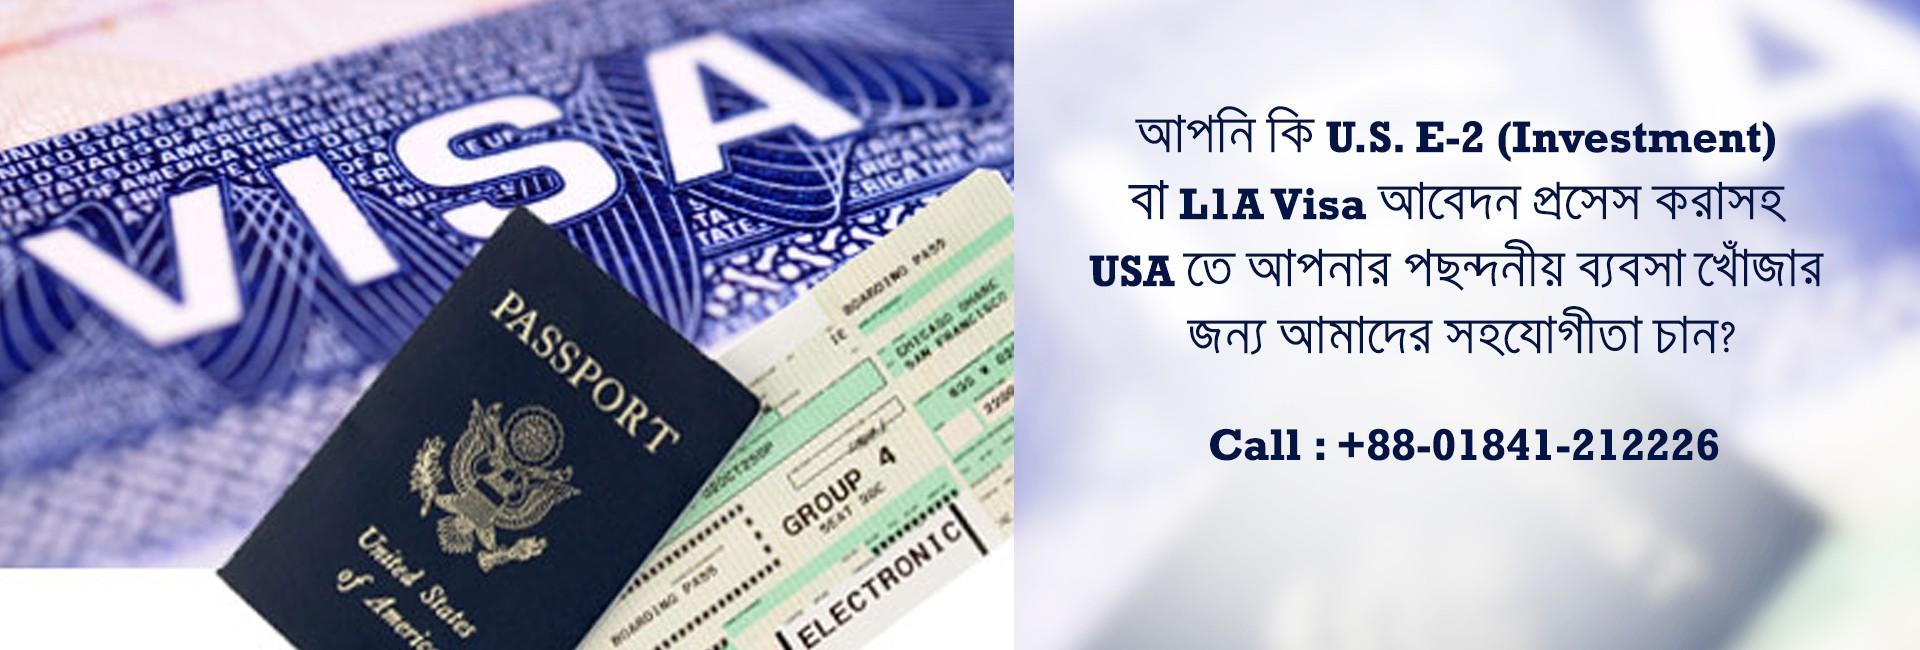 E-2 (Investment) & L1-A Visa – M  R  I  CHOWDHURY & ASSOCIATES